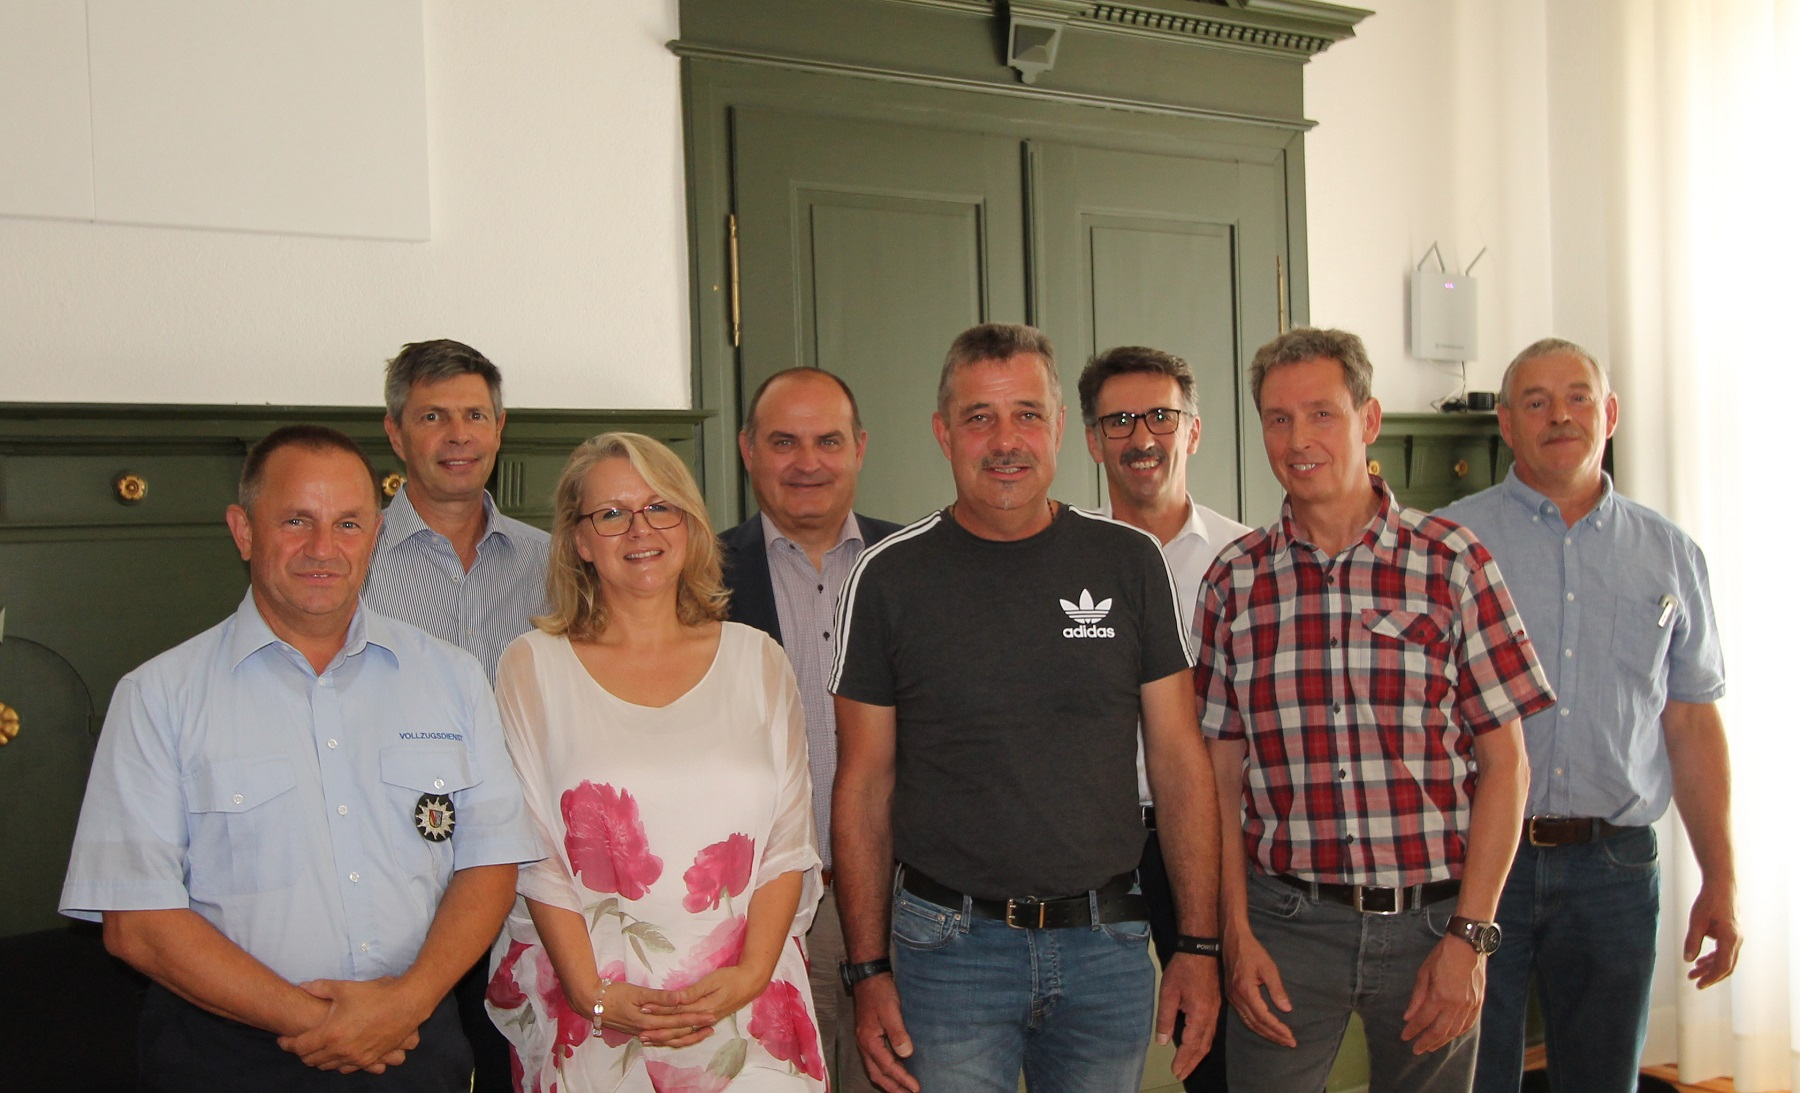 v.l.: Mario Bertolotti, Bürgermeister Christof Nitz, Anja Becker-Nikolai, Thomas Spohn, Bernd Lange, Jürgen Sänger, Bernhard Karle, Andreas Gaenzle